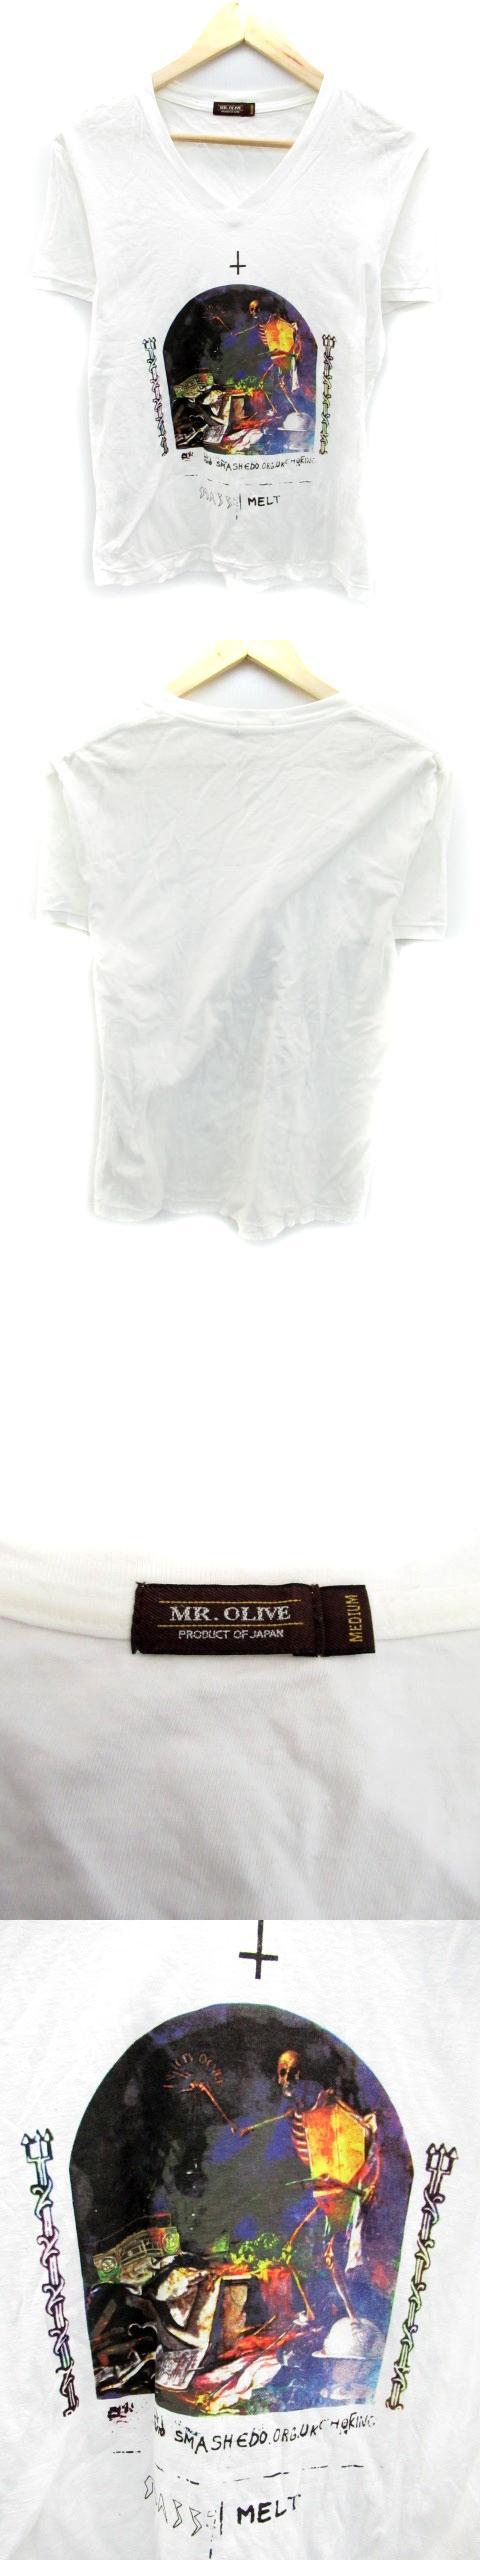 Tシャツ カットソー 半袖 Vネック イラスト M ホワイト 白 /YH9